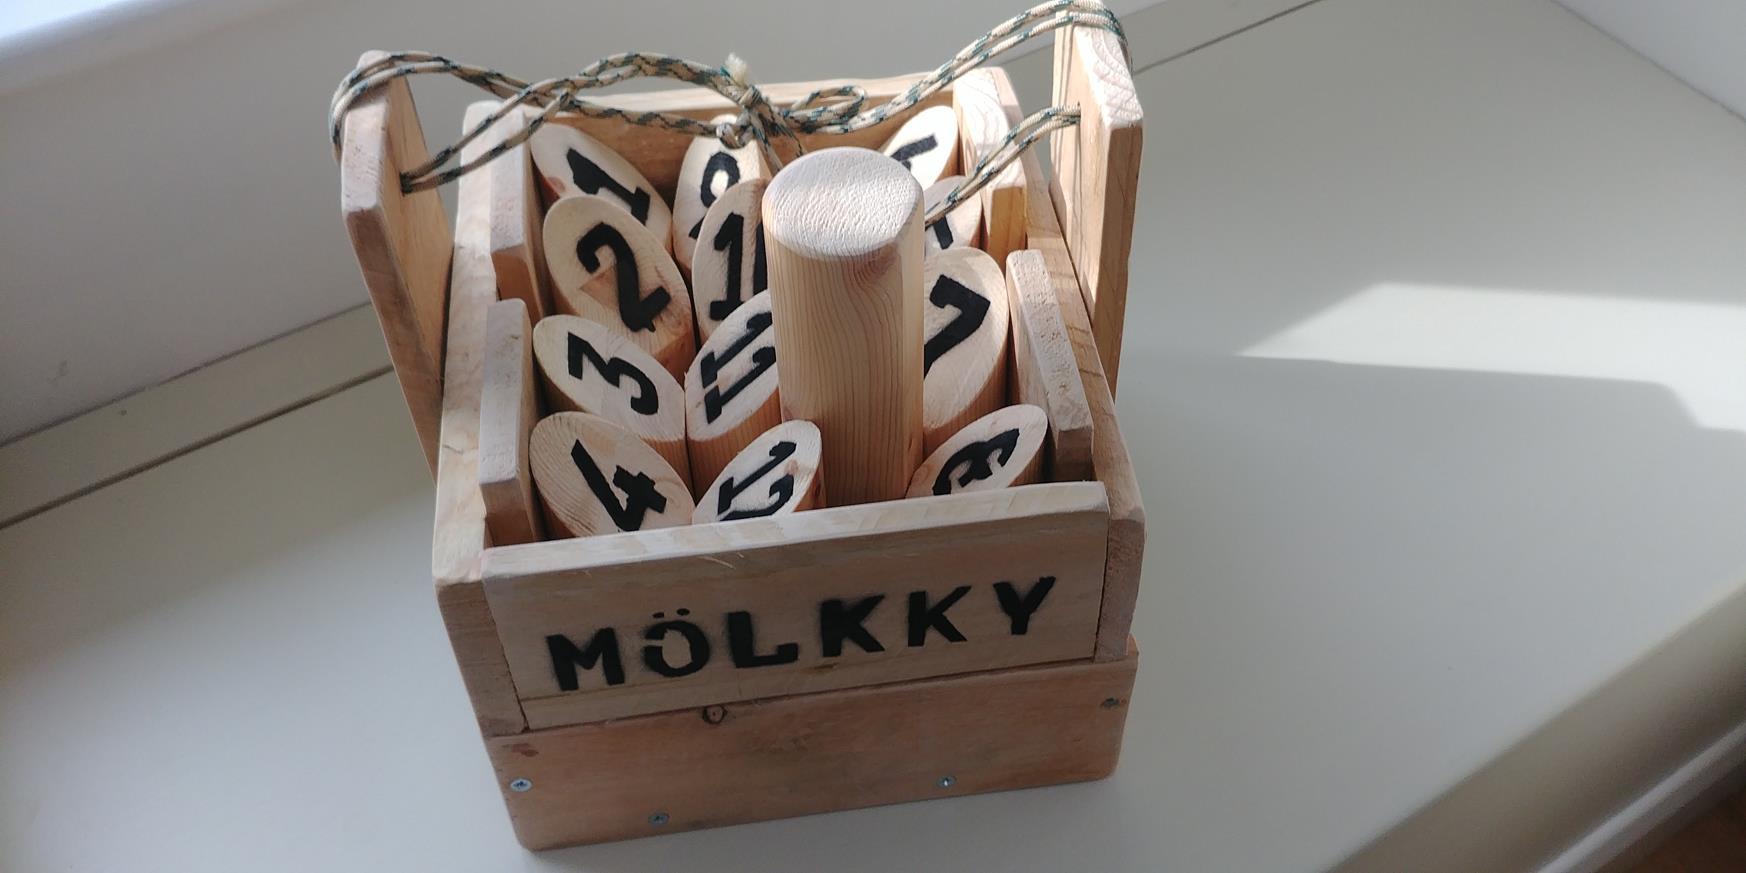 Home Made Finska (molkky) Set